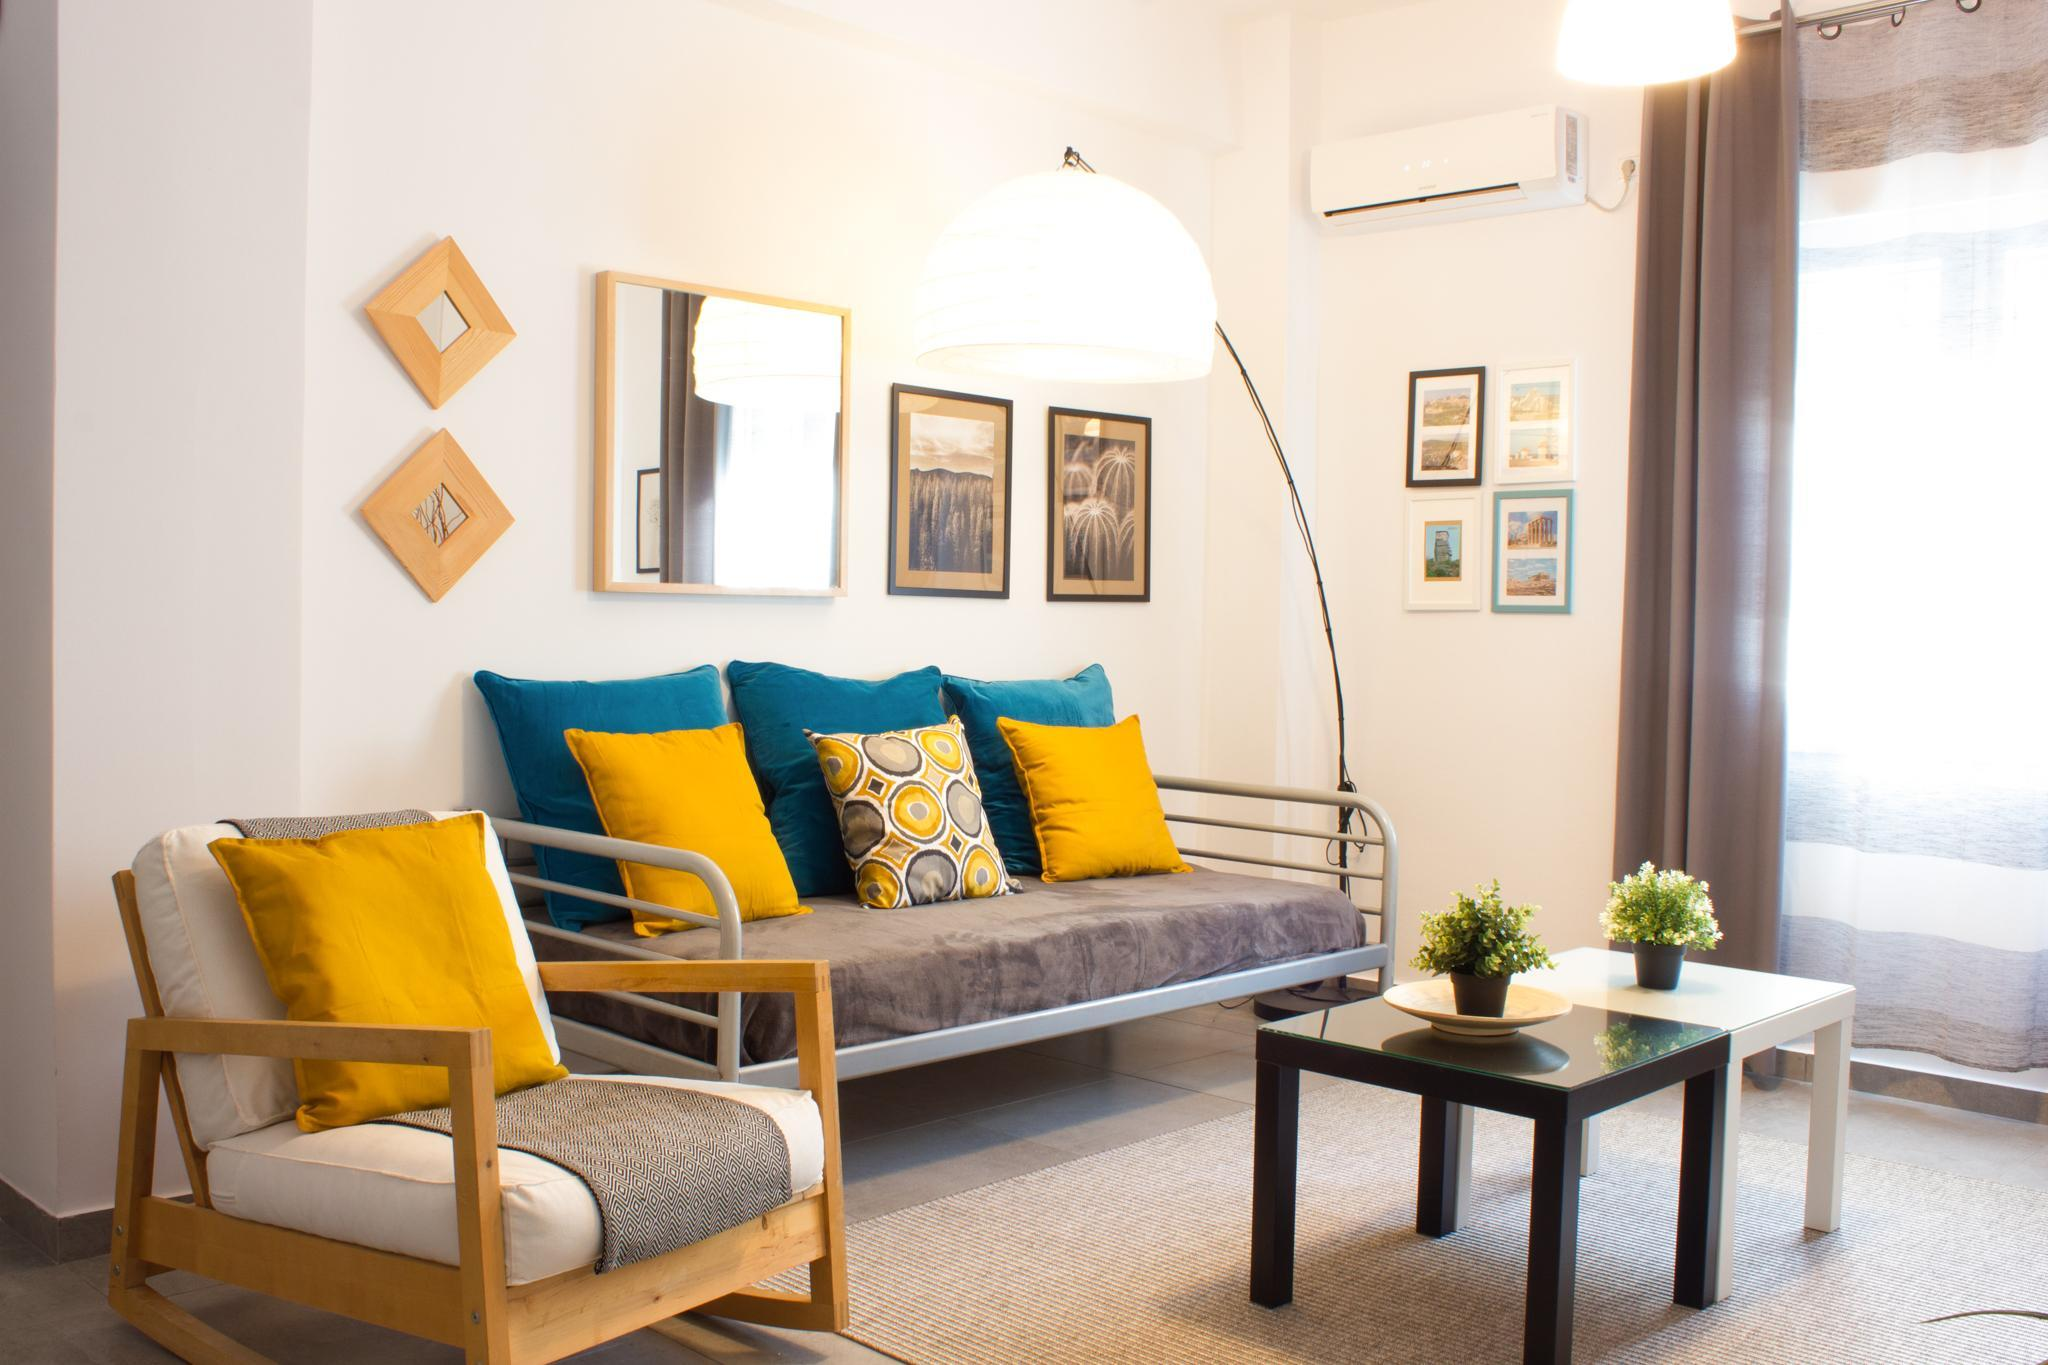 Athens Cozy Apartment Close To Acropolis Museum